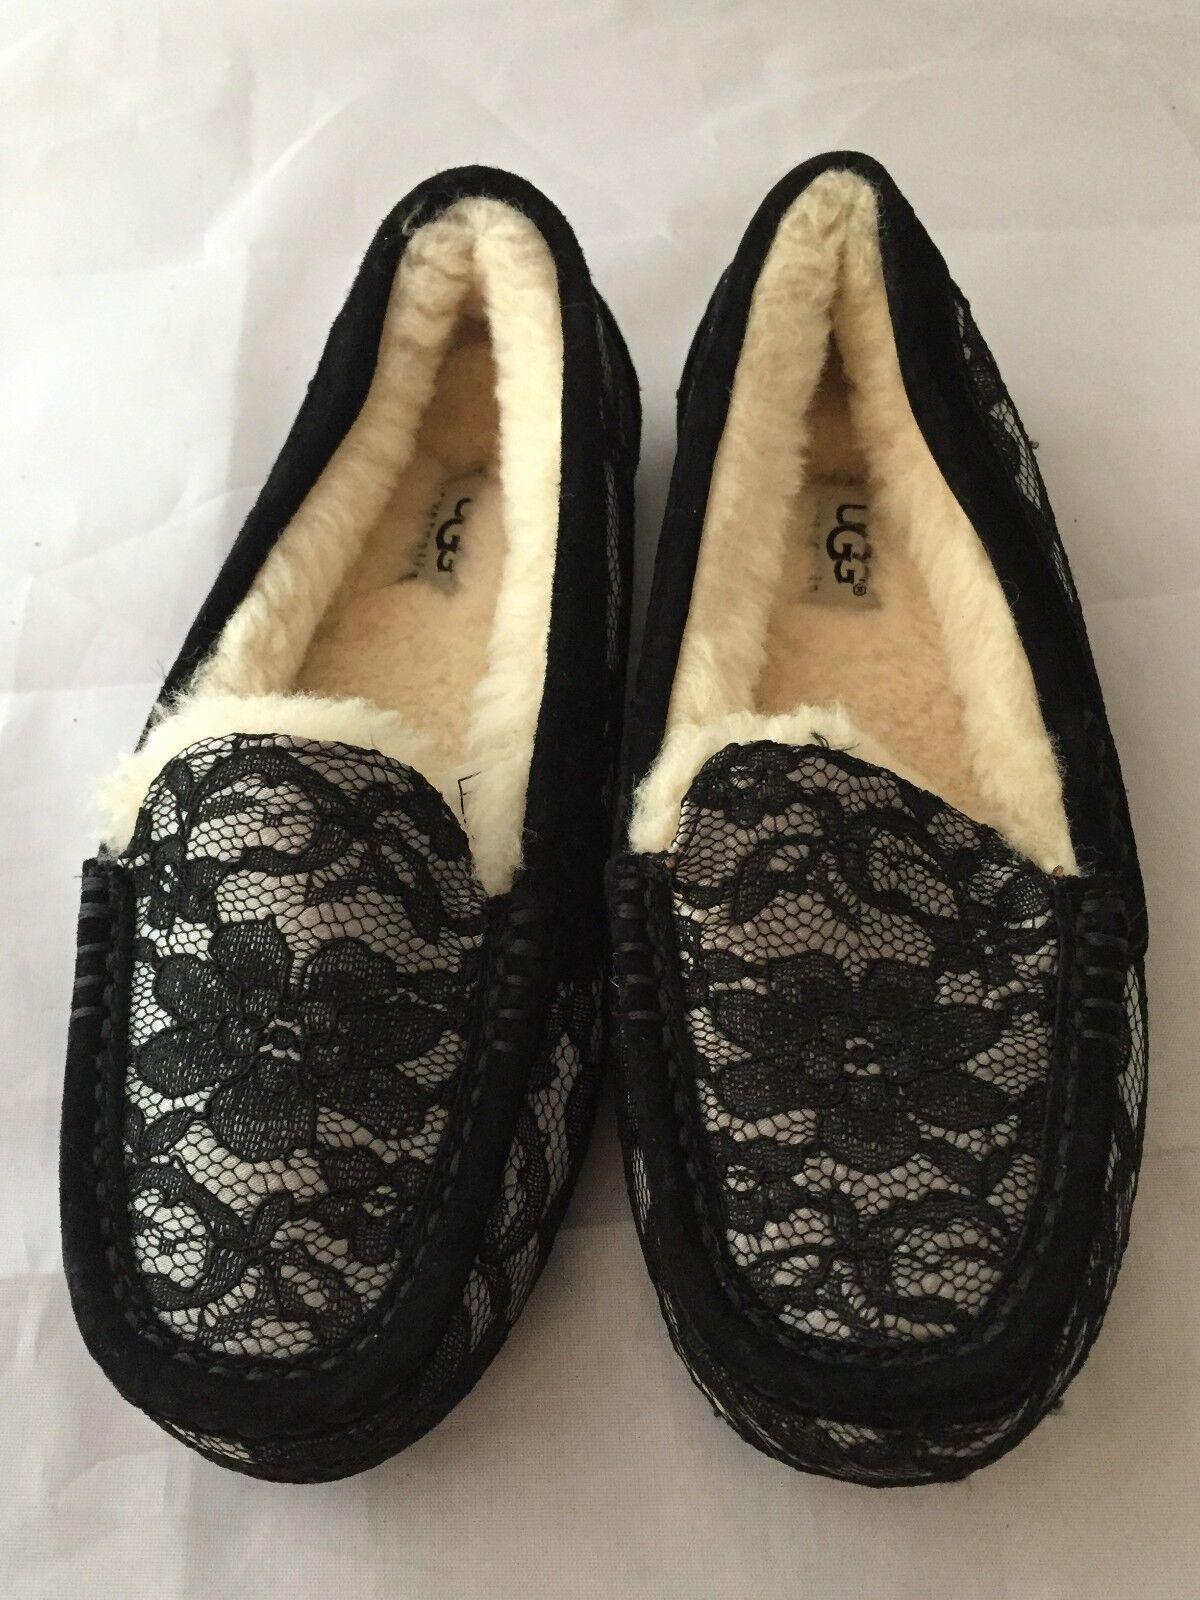 87b3a265137 UGG Australia Ansley Antoinette Black Lace SLIPPER Women Size 5